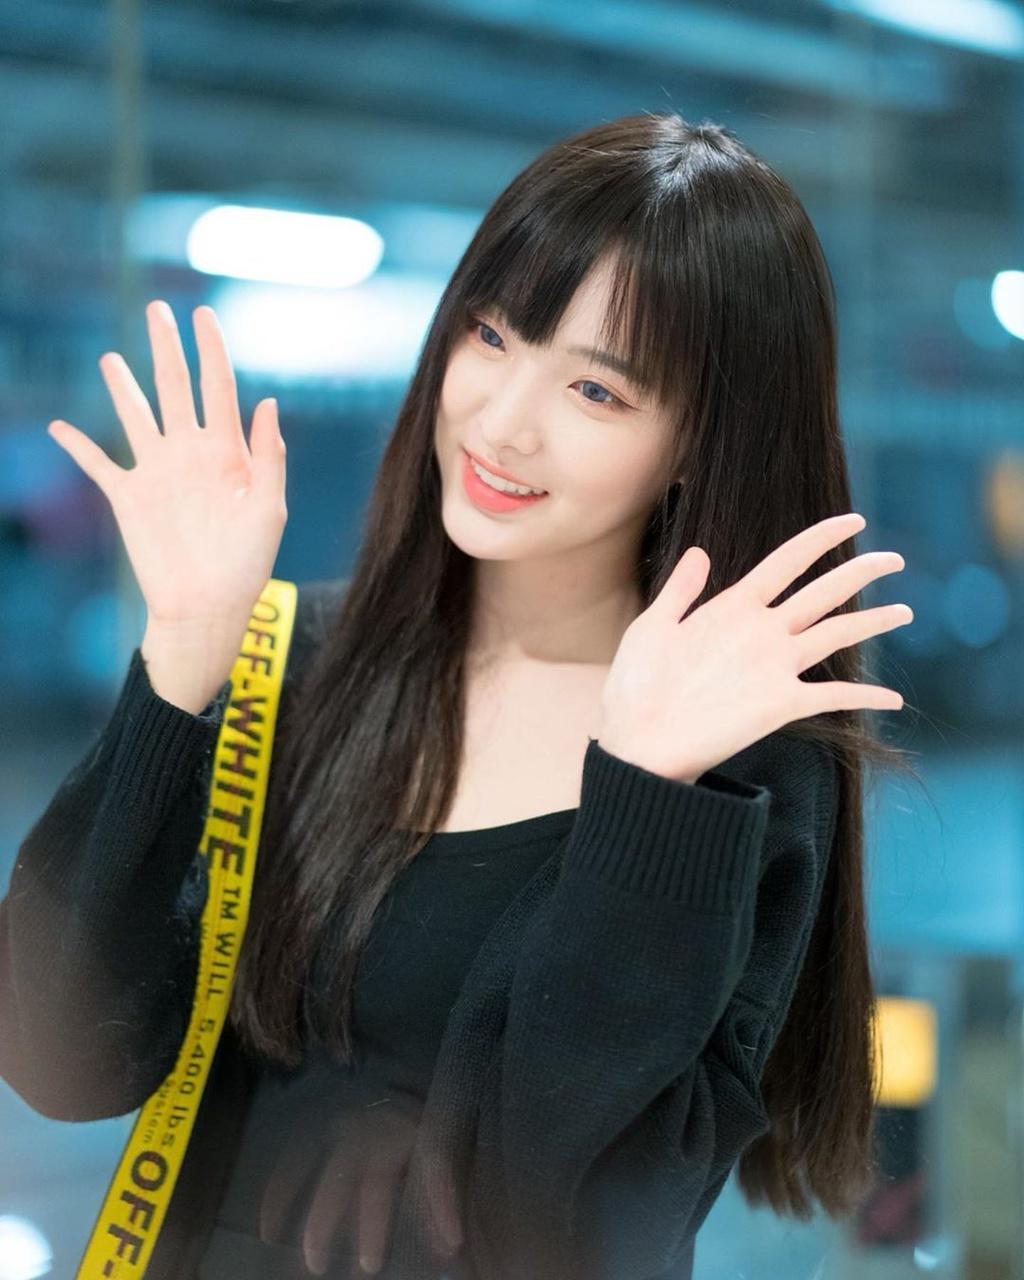 Hot girl 'Lat mat 3' cua Ly Hai tham gia show song con ban Trung hinh anh 8 82336918_815489238920186_484585032204980638_n.jpg